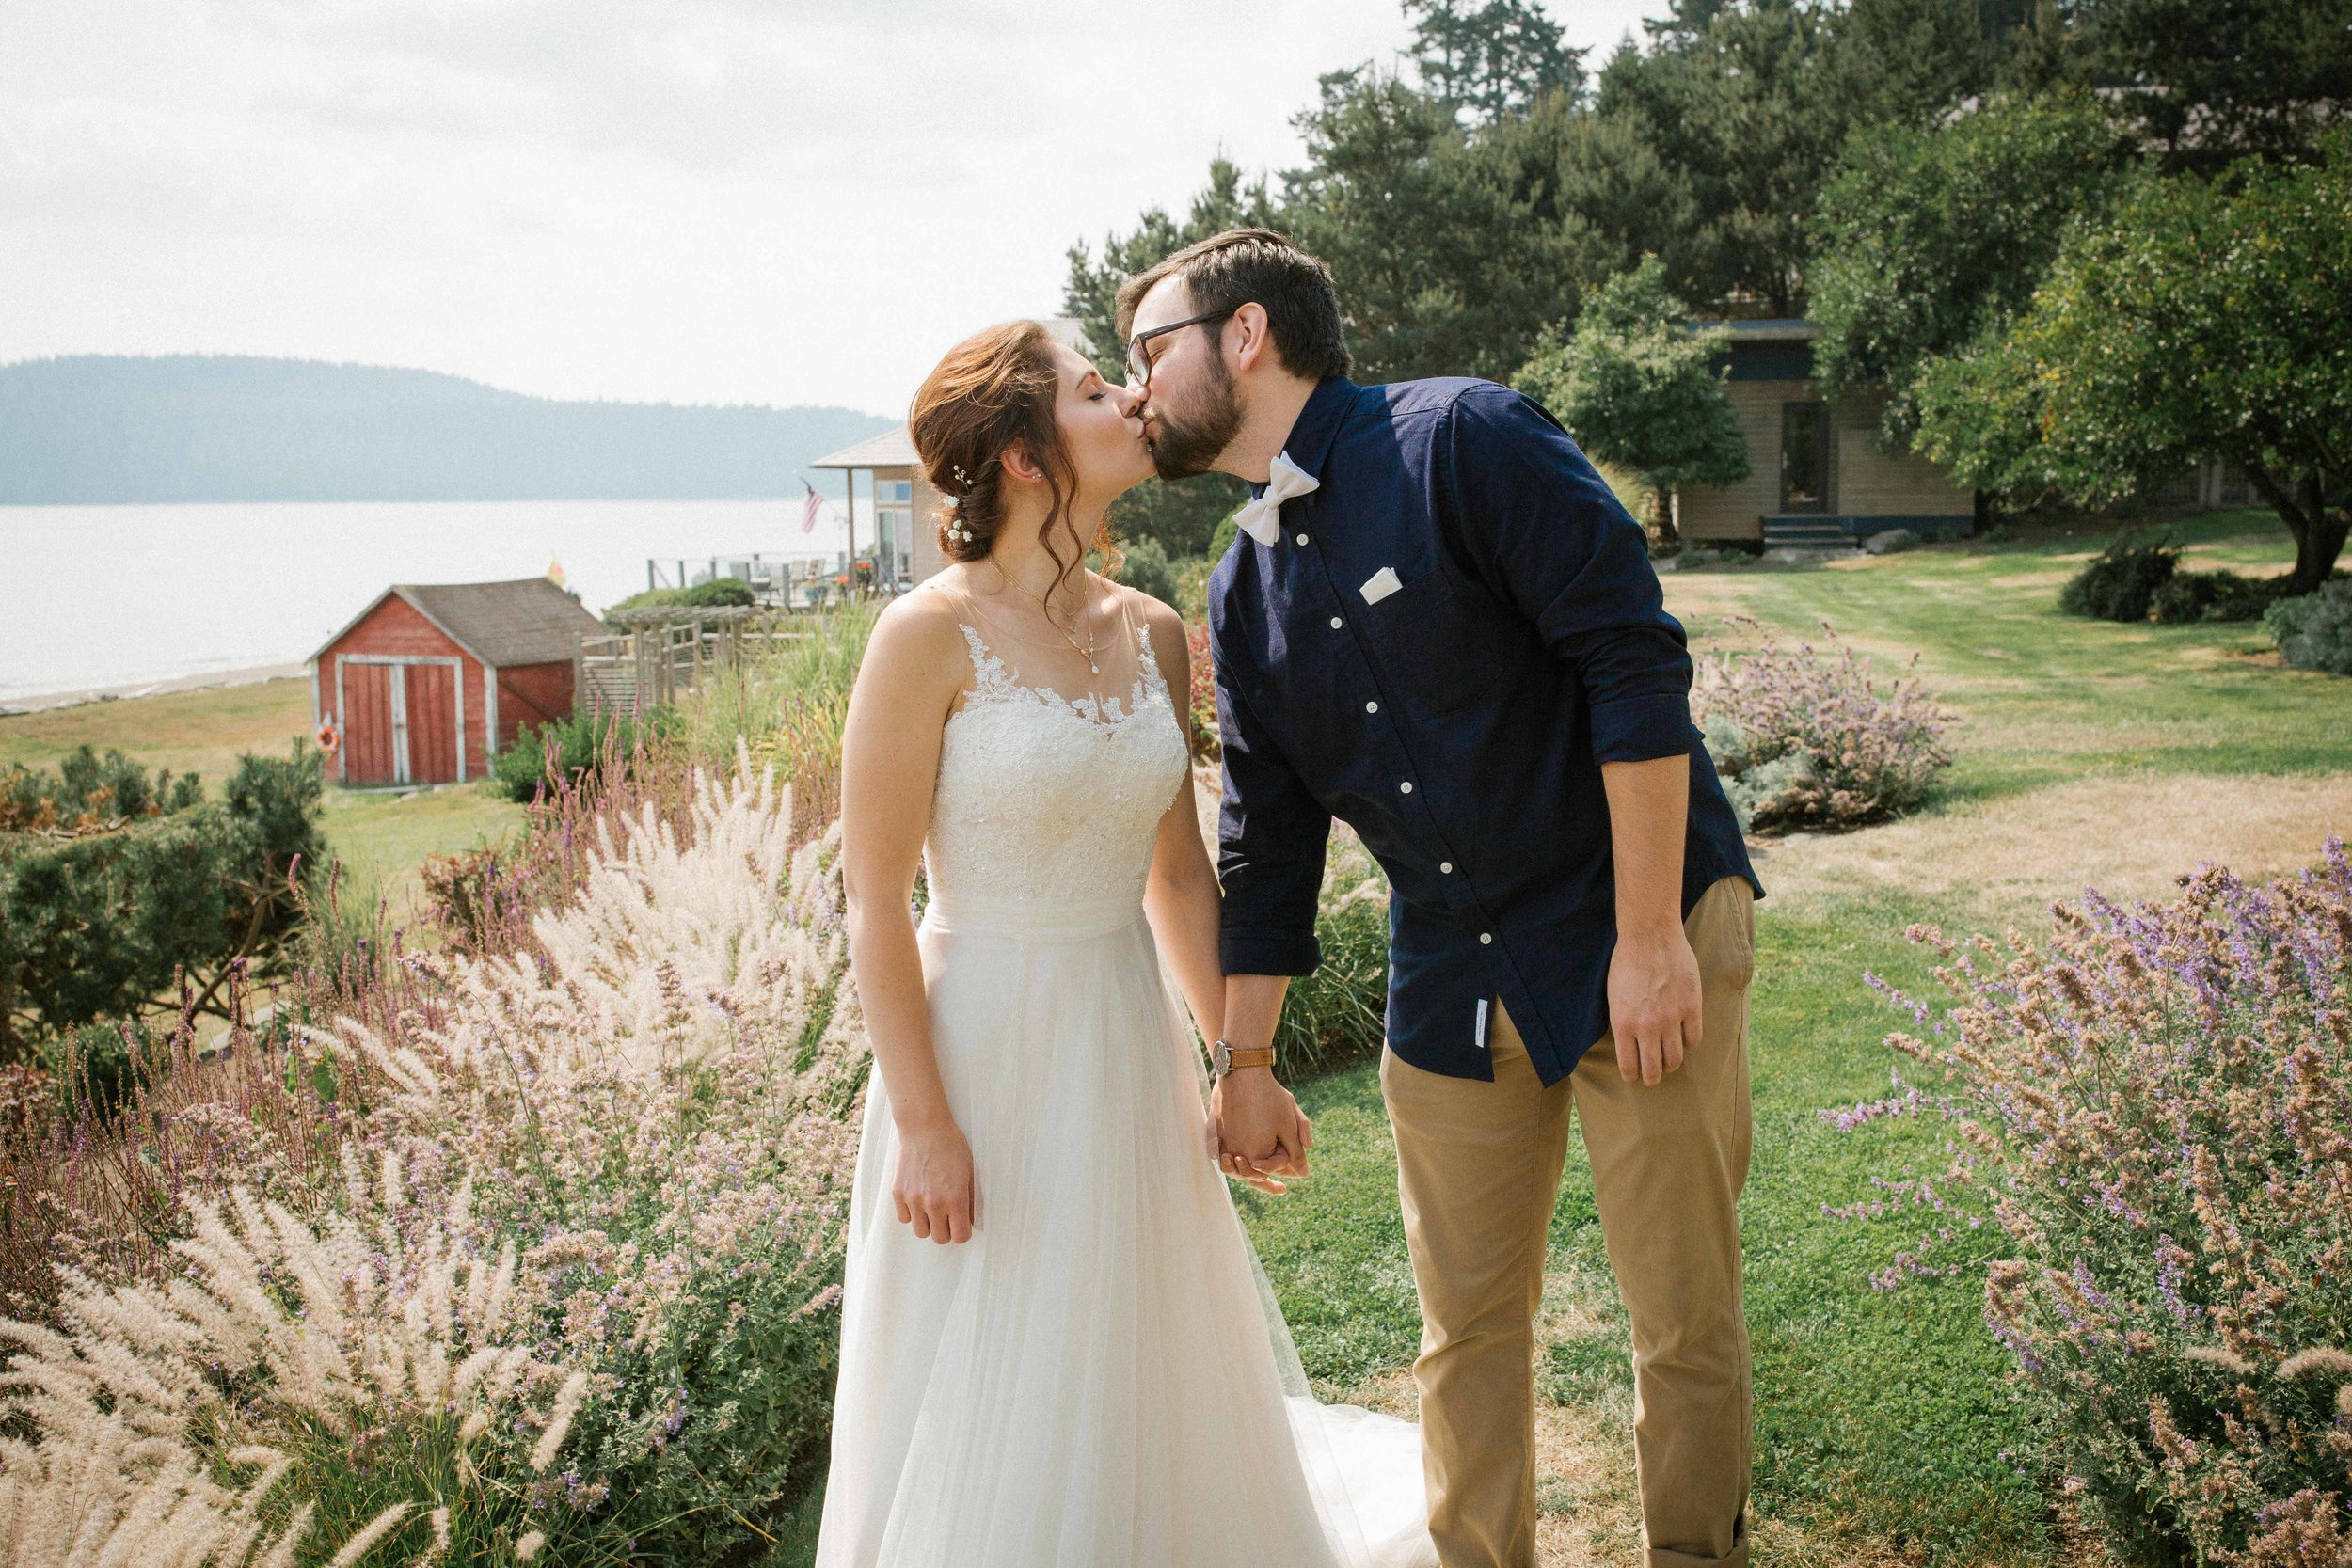 deception-pass-wedding-24.jpg